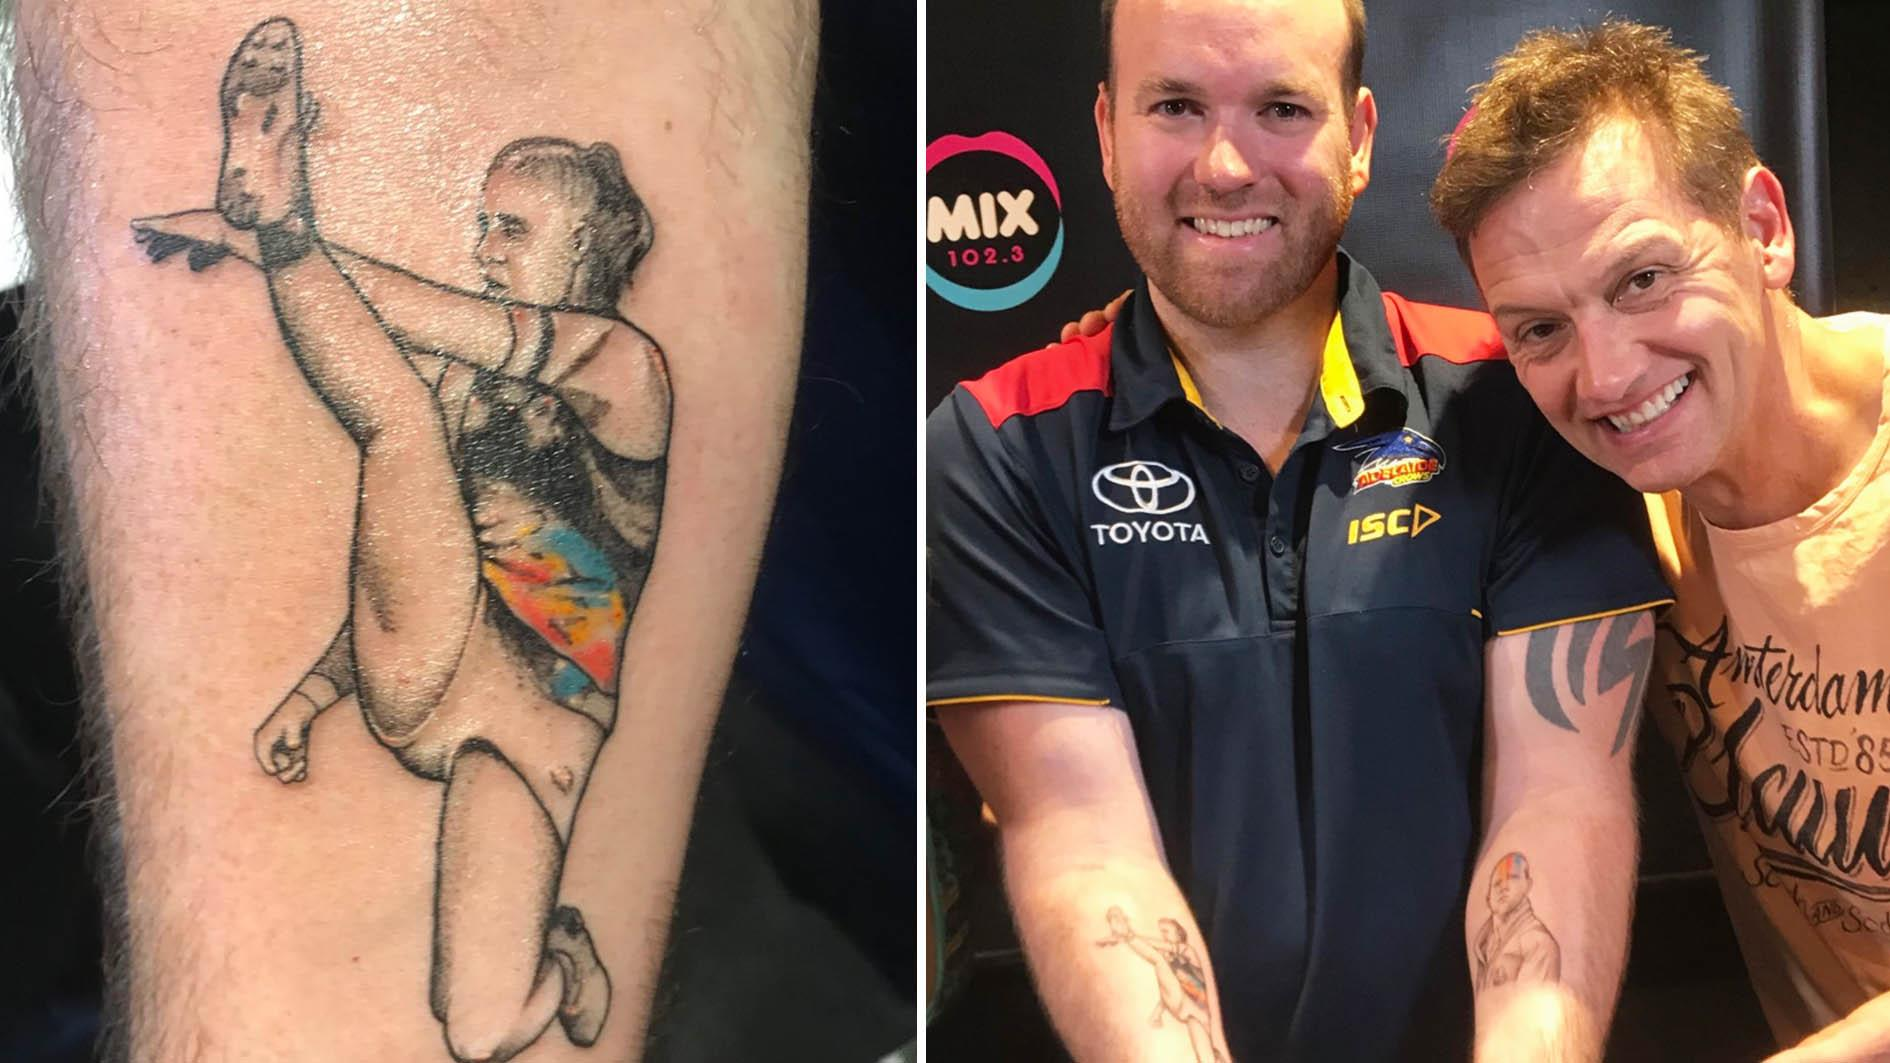 'Get a life': Footy fan with Tayla Harris tattoo hits back at trolls